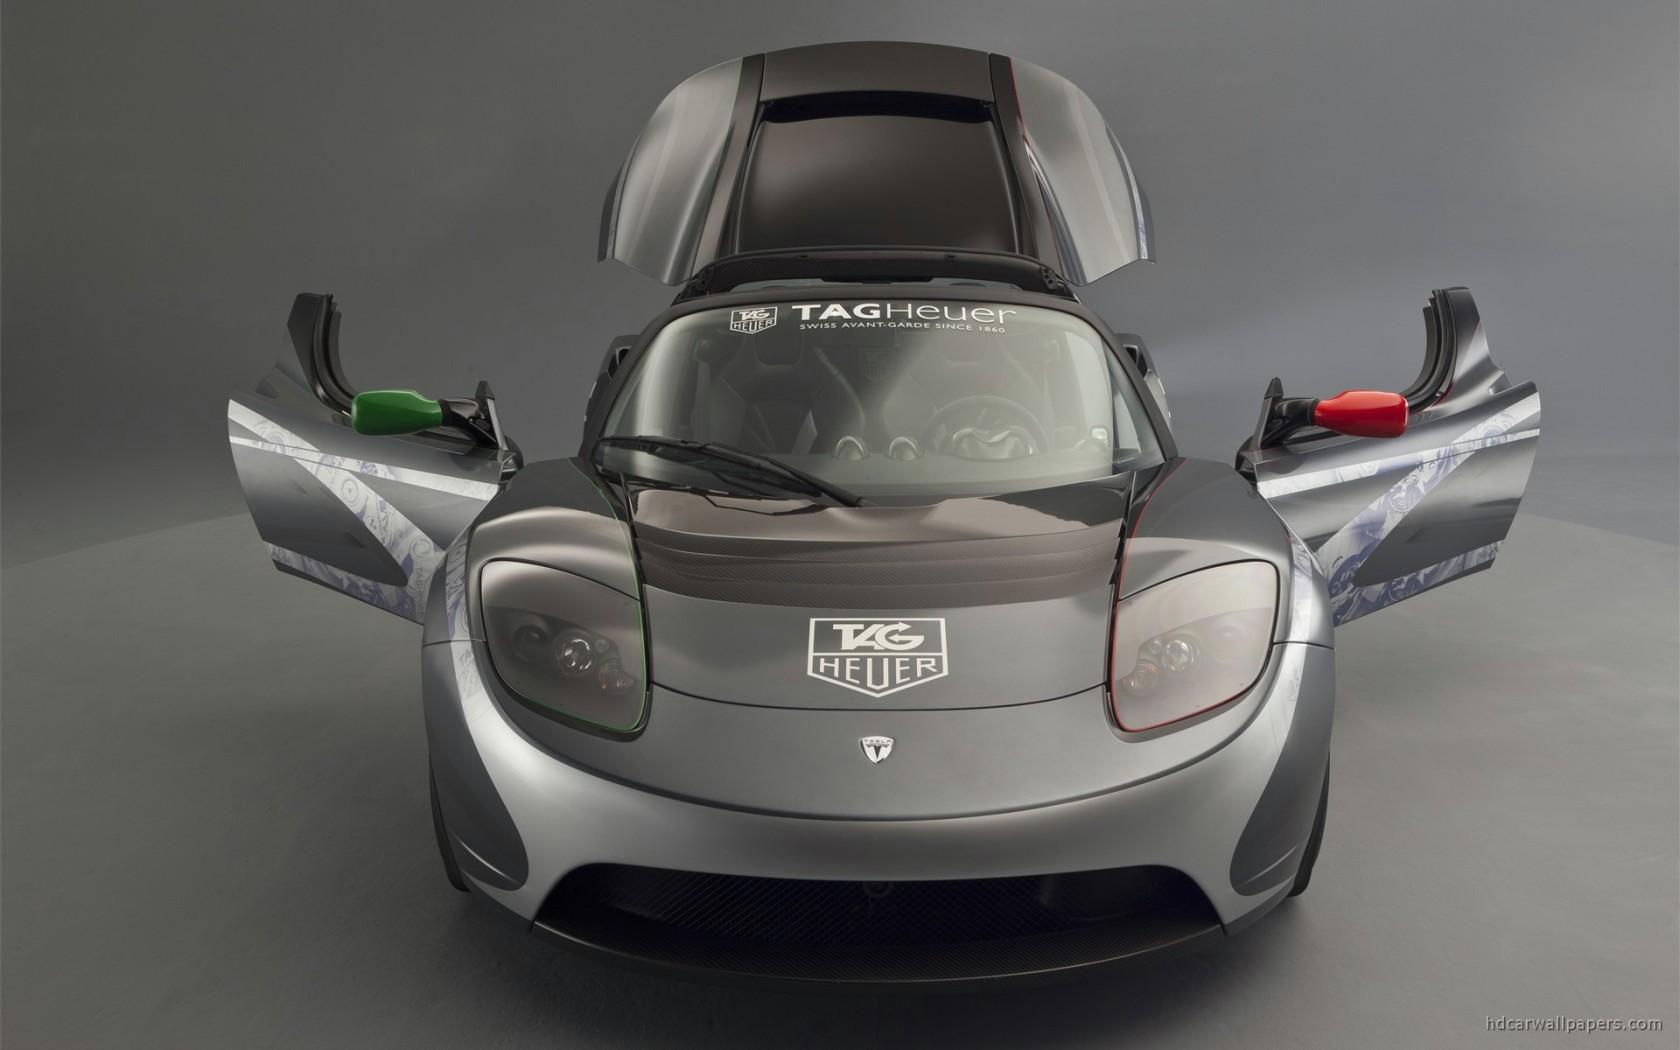 Tag Heuer Tesla Roadster 2 Wallpaper Hd Car Wallpapers